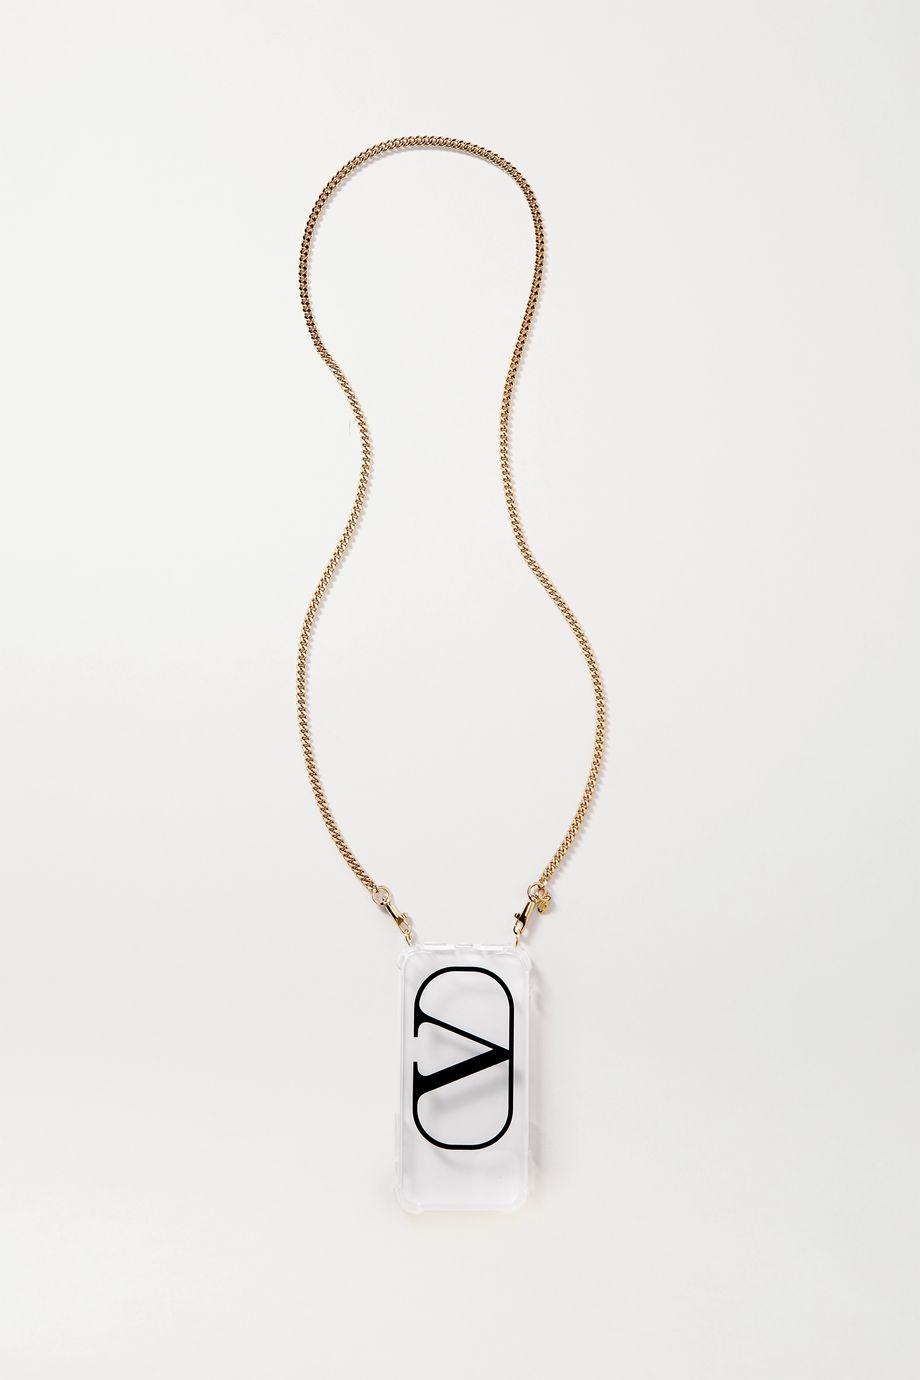 Valentino 印花有机玻璃 iPhone 11 保护壳